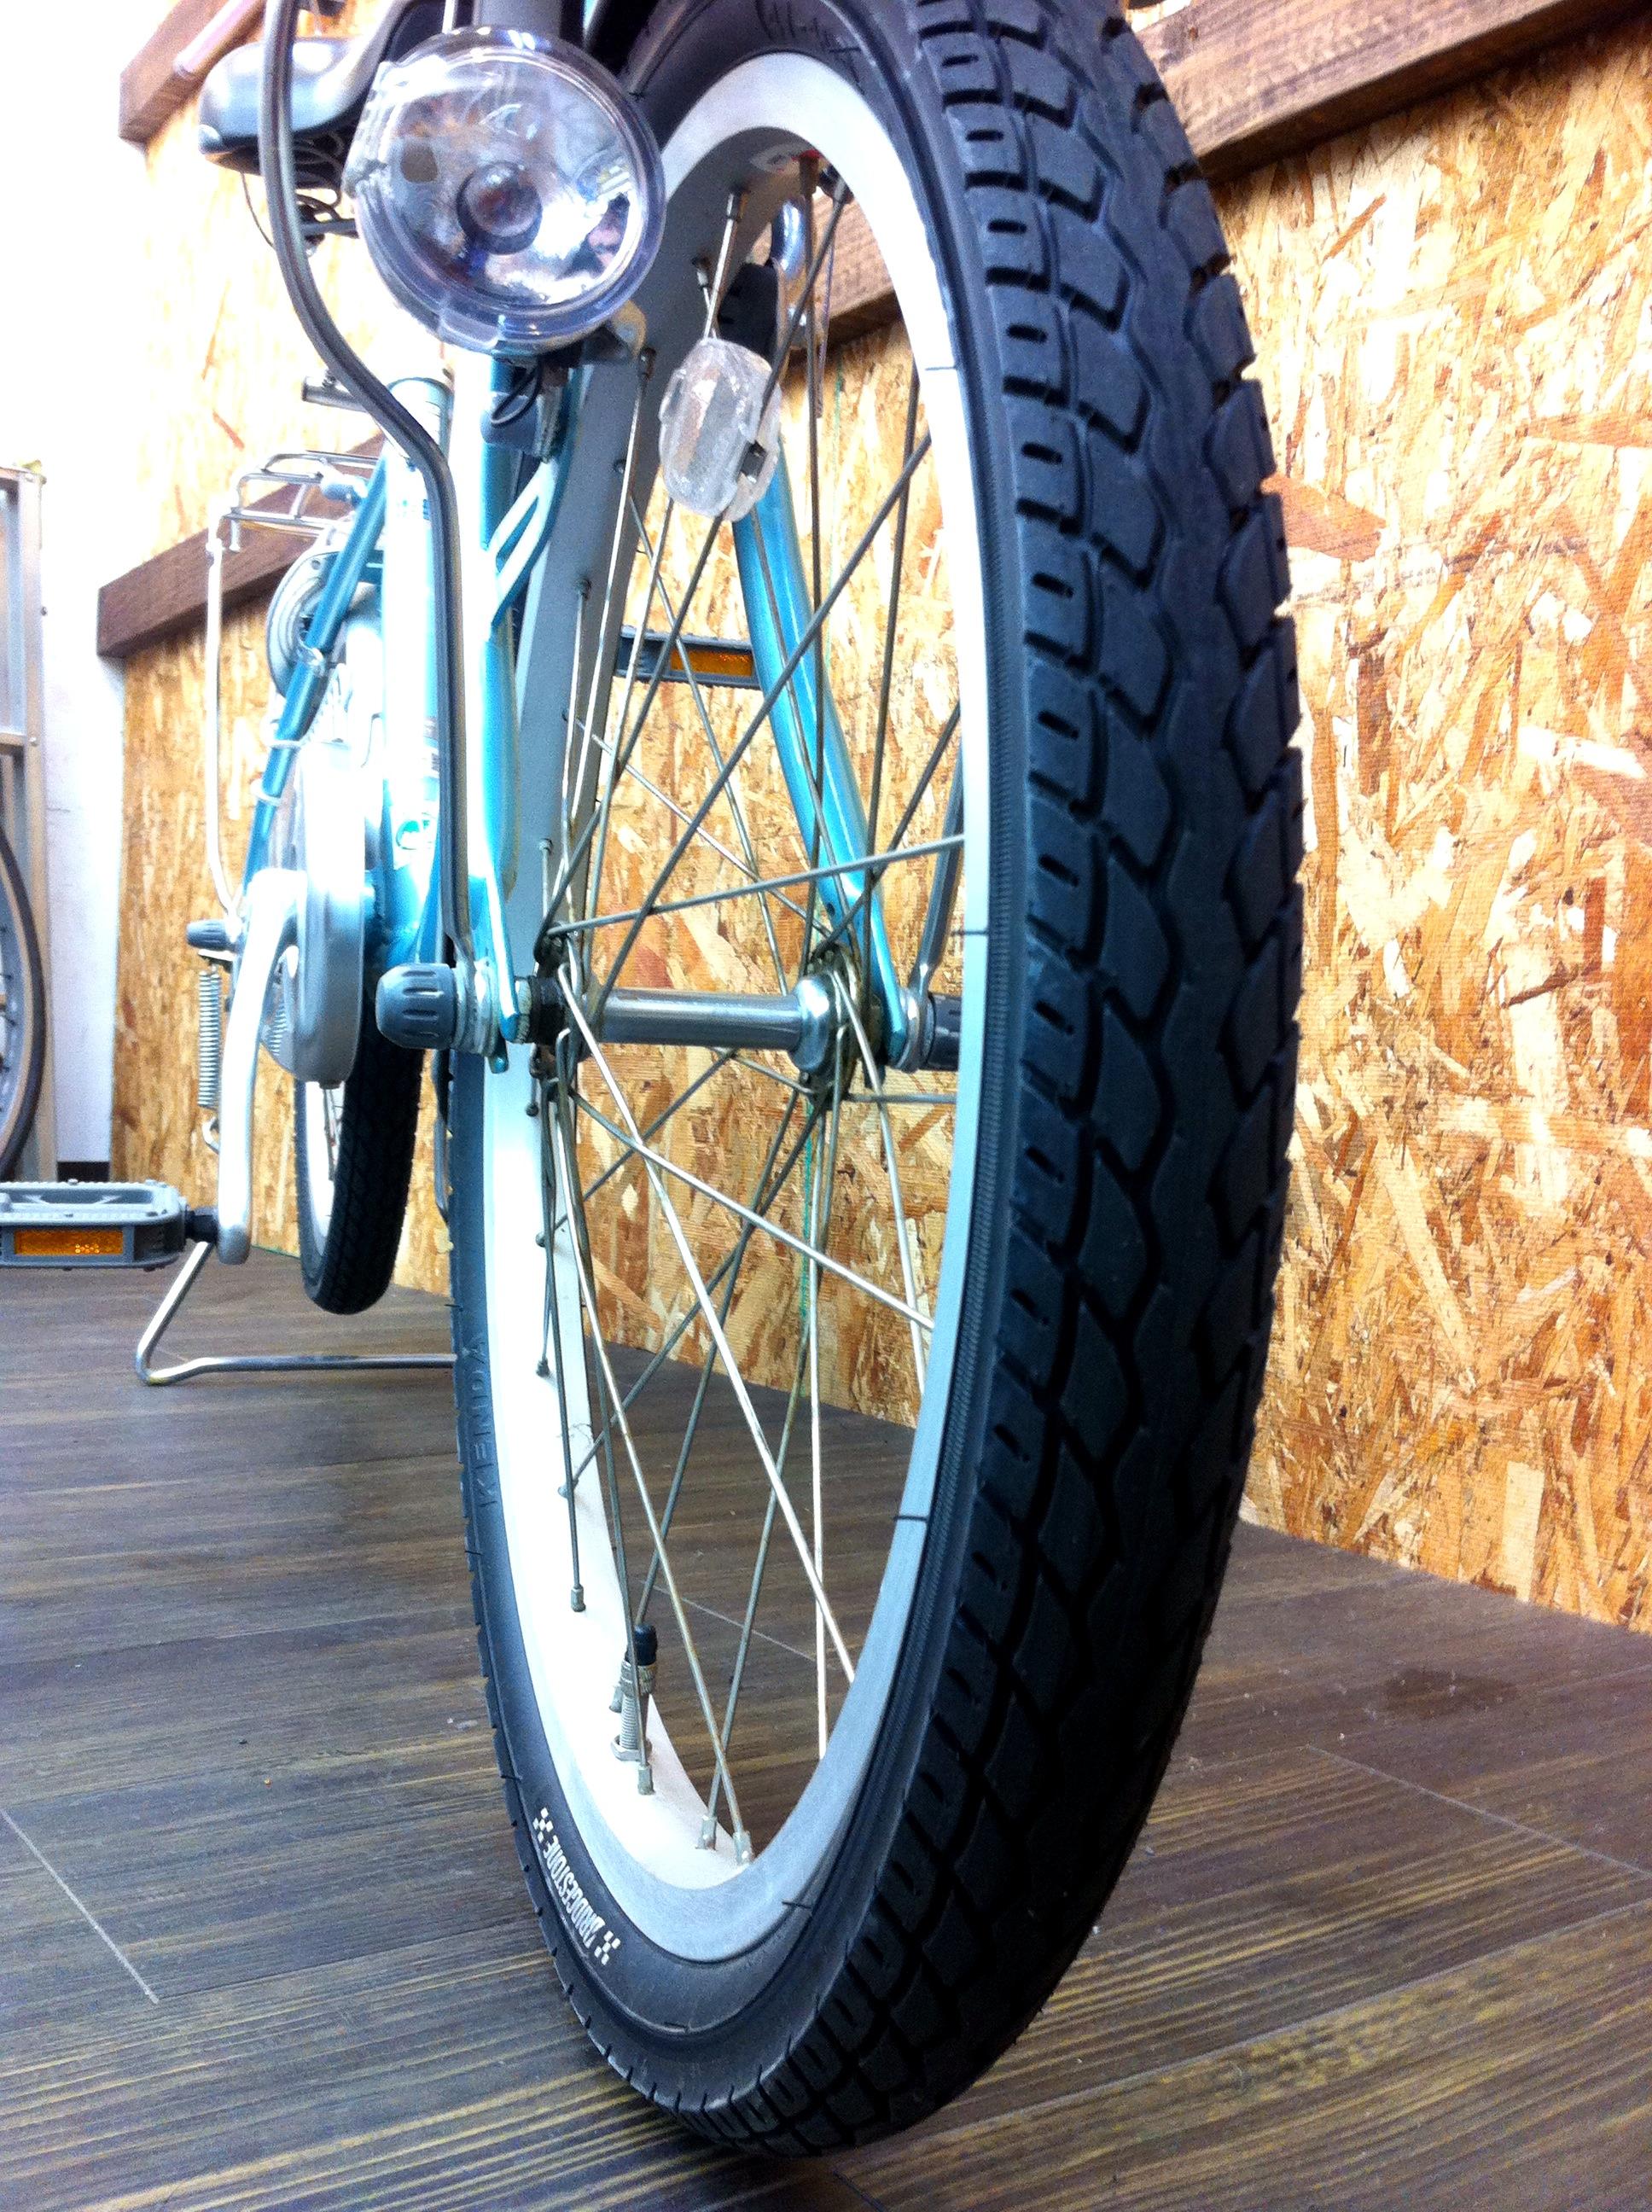 中古自転車 中古自転車 京都 : CALISIA | 京都の中古自転車 ...